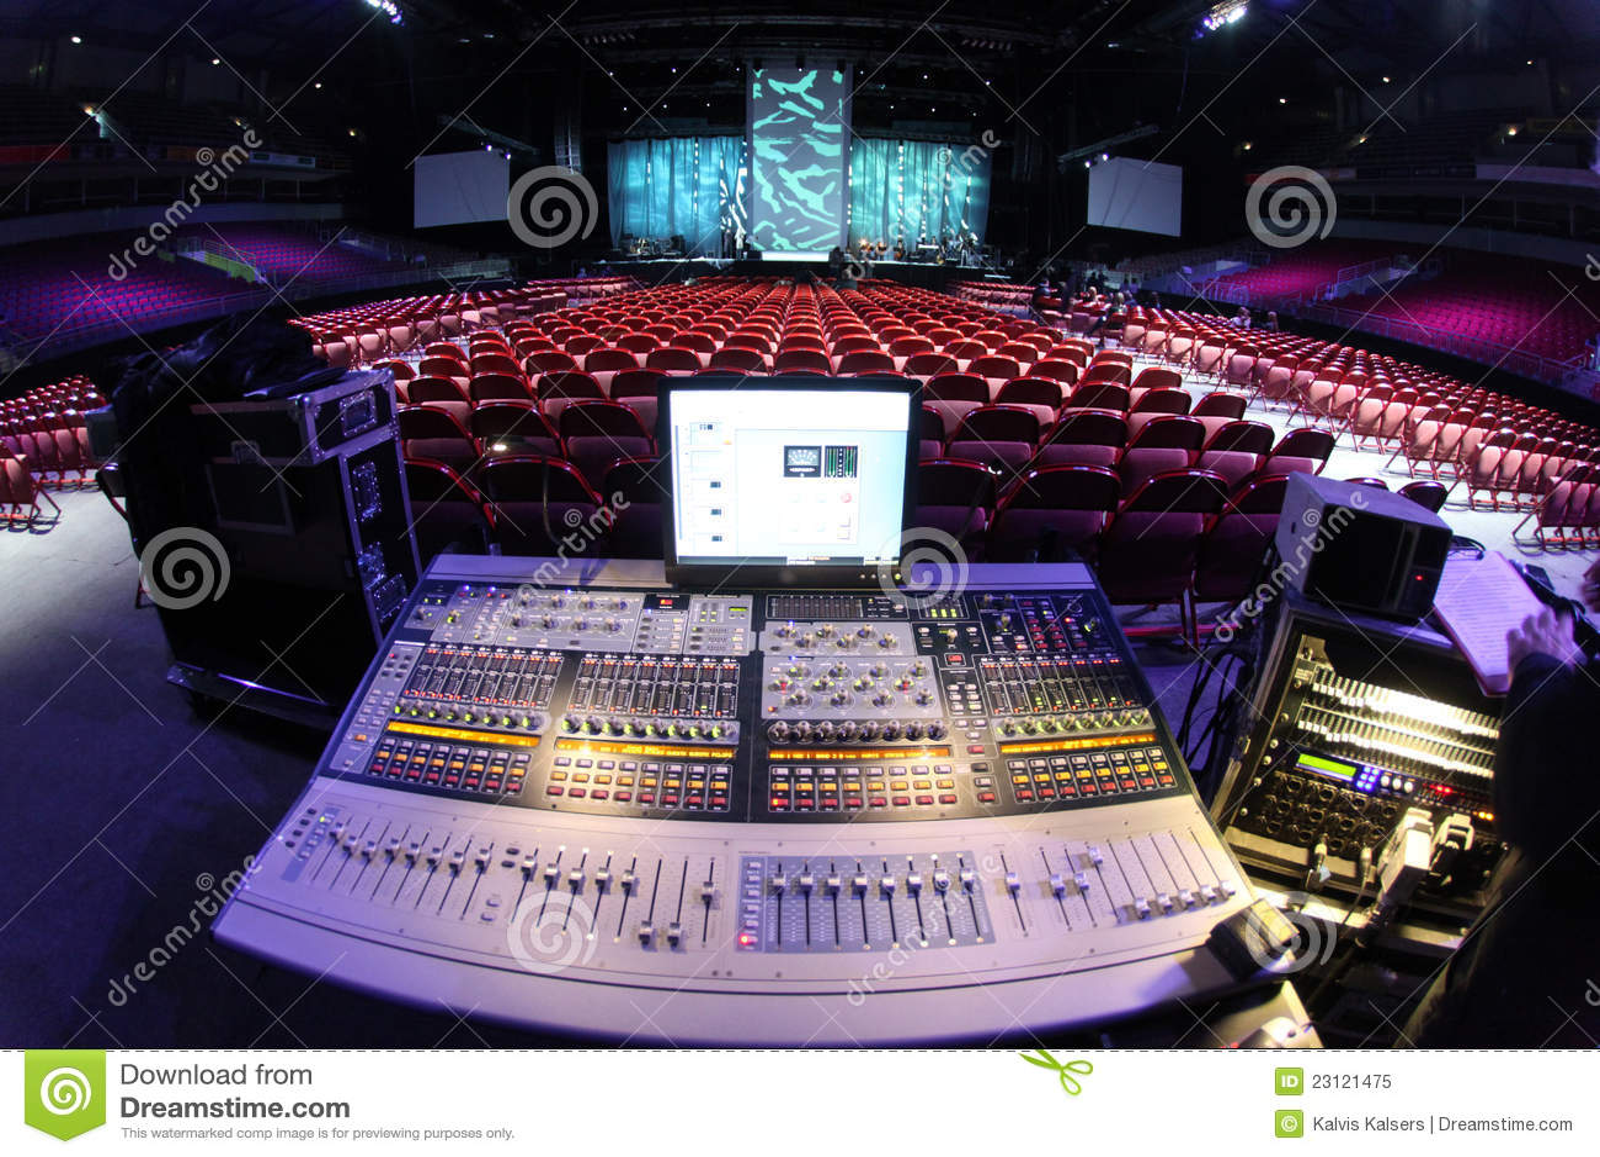 Sound system in concert stock illustration Image of